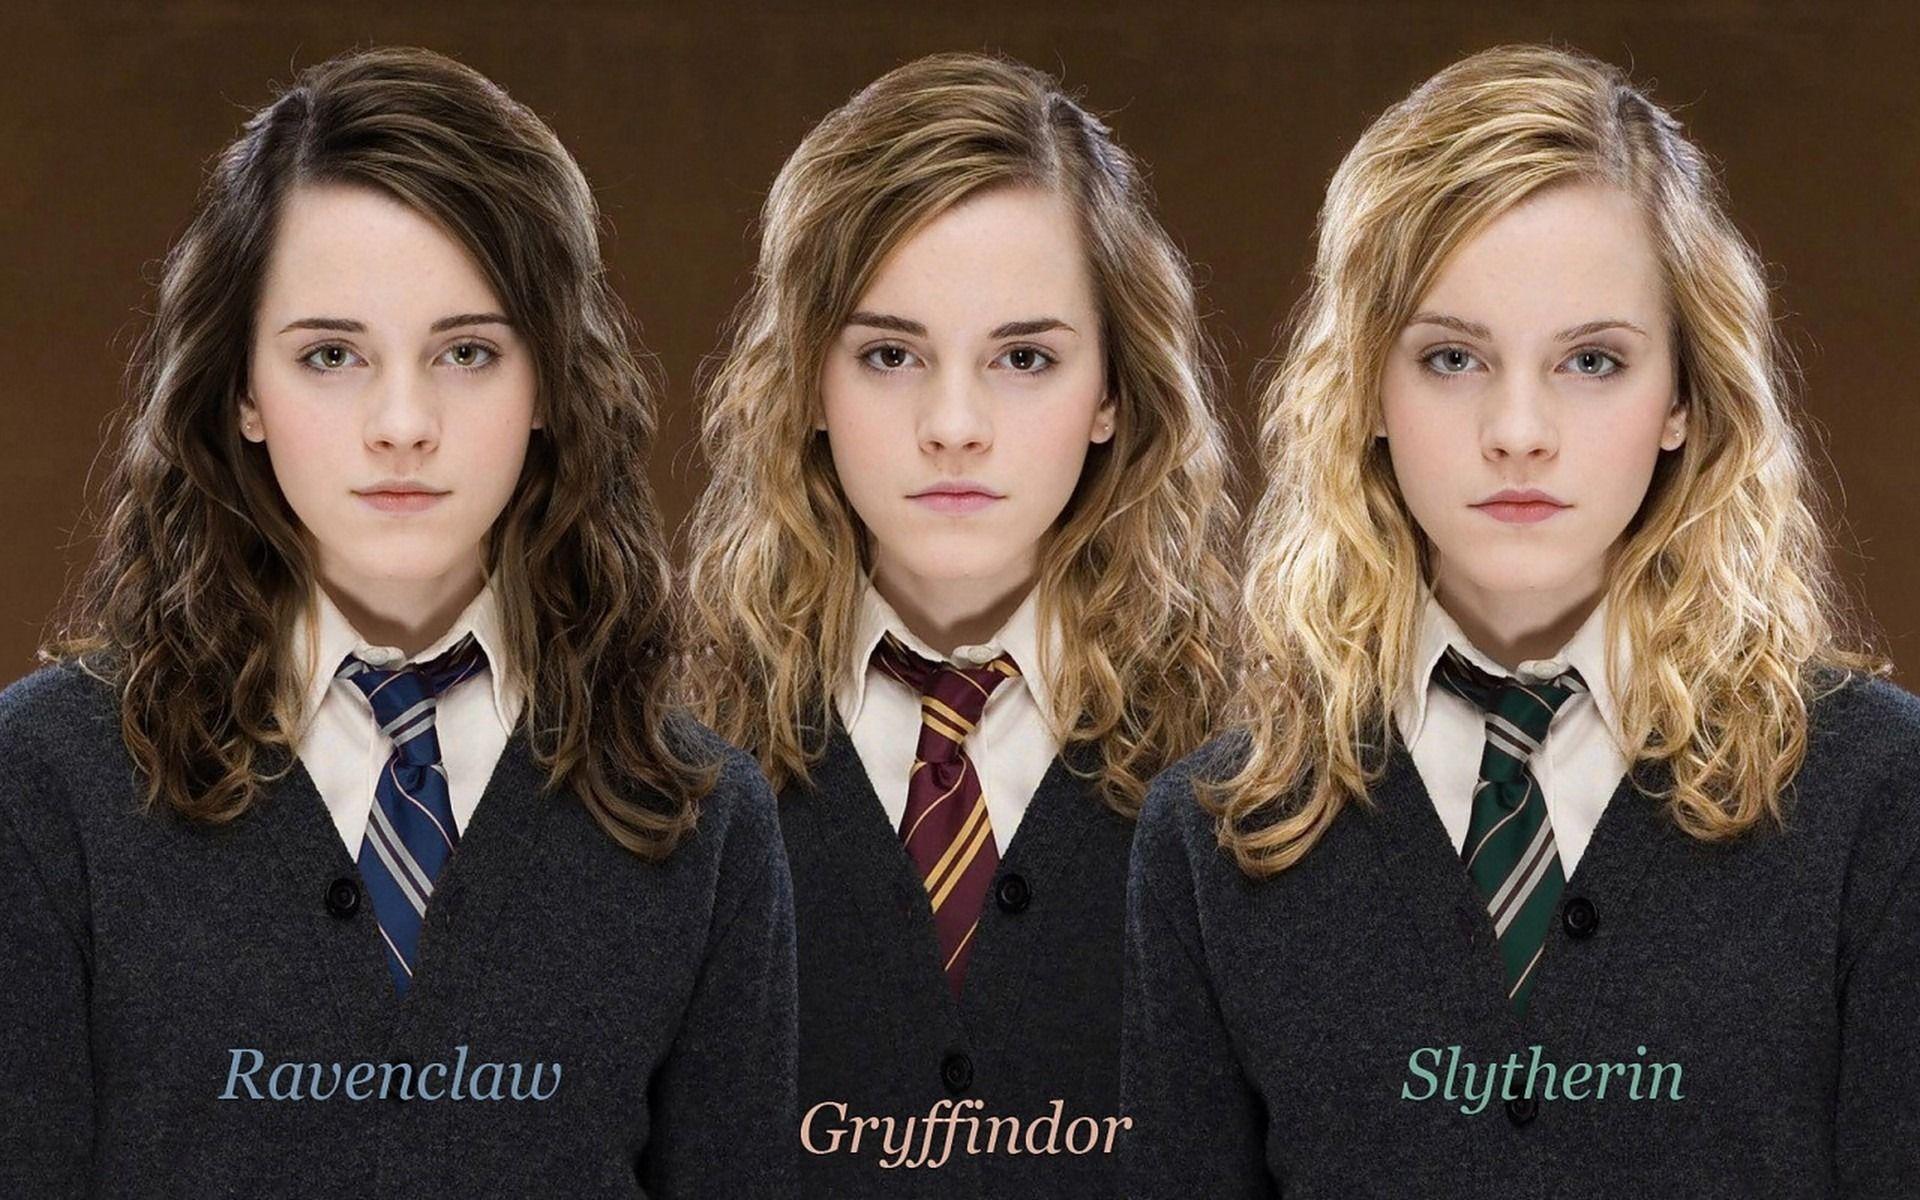 Best Wallpaper Harry Potter Friend - b5718298e15aba62e28dc364b58db039  Perfect Image Reference_553770.jpg